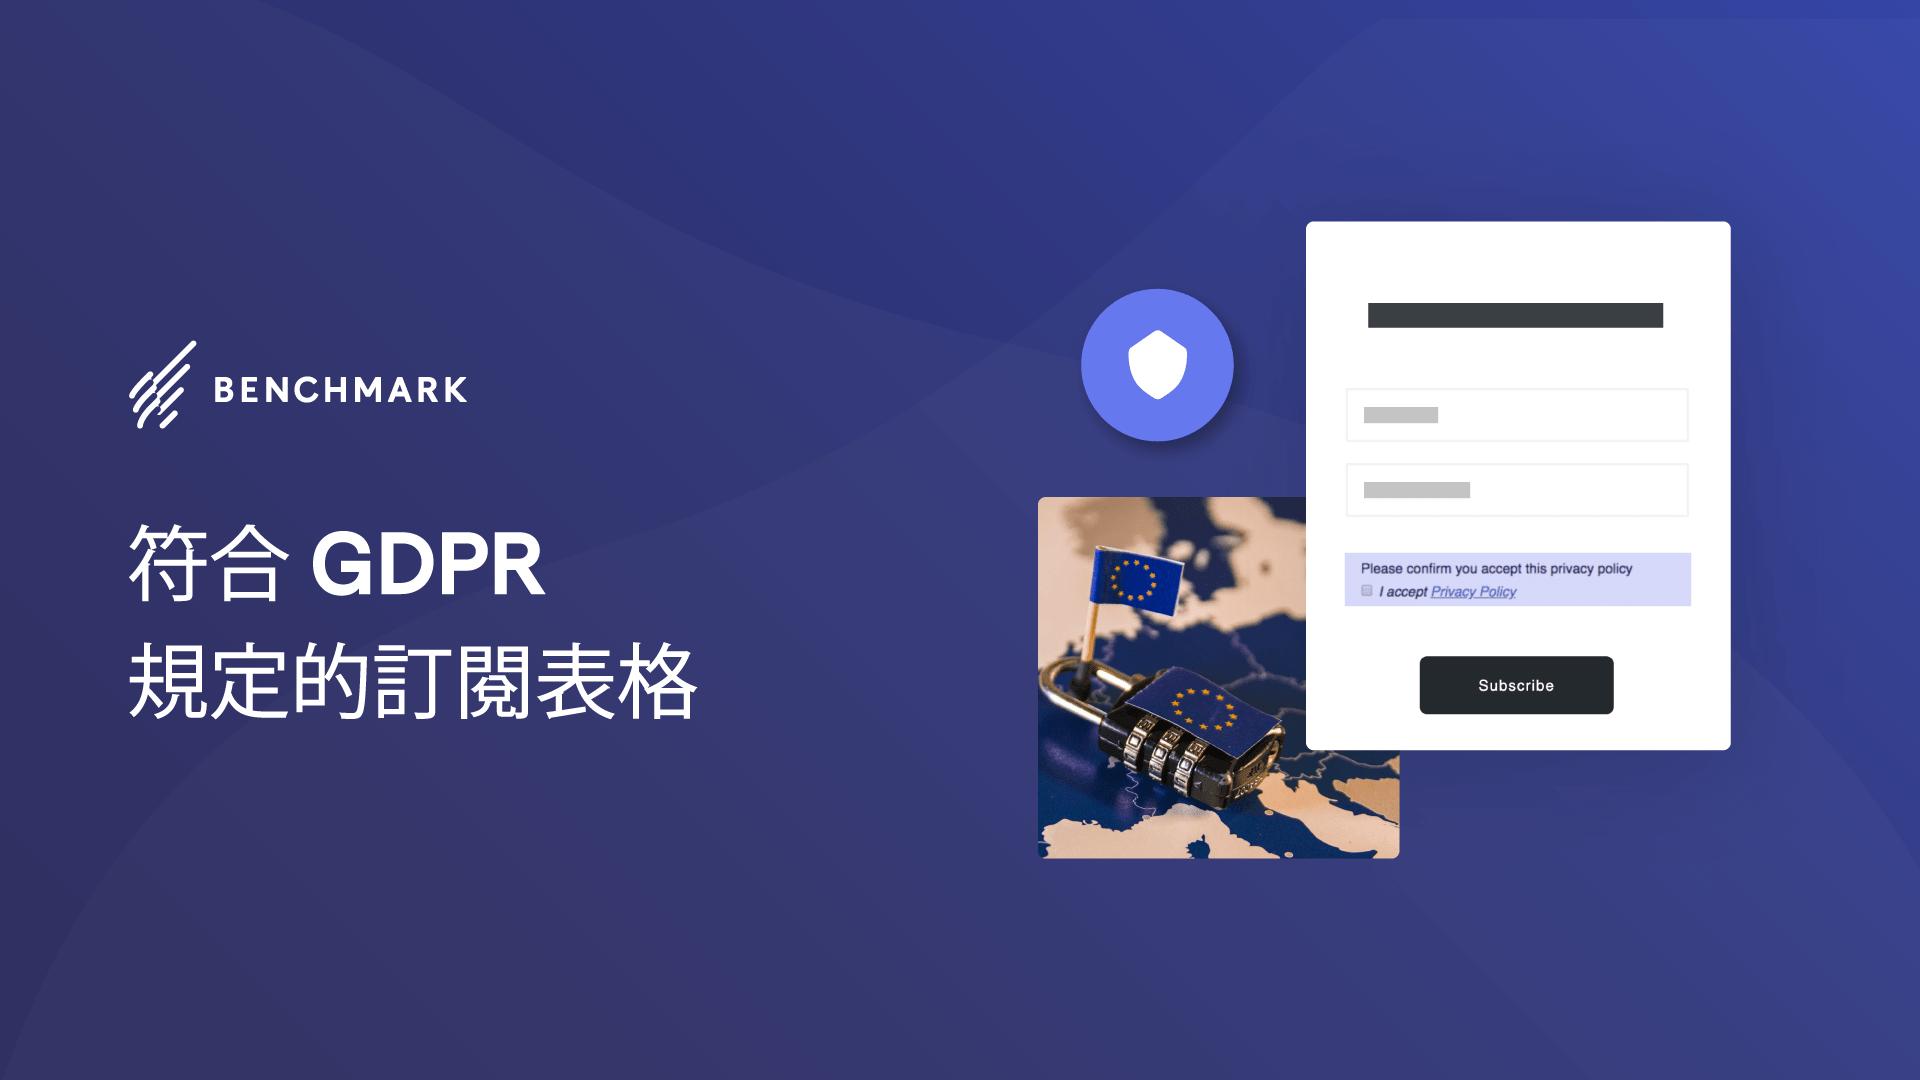 符合GDPR規定的訂閱表格 - 簡體中文 Benchmark Email